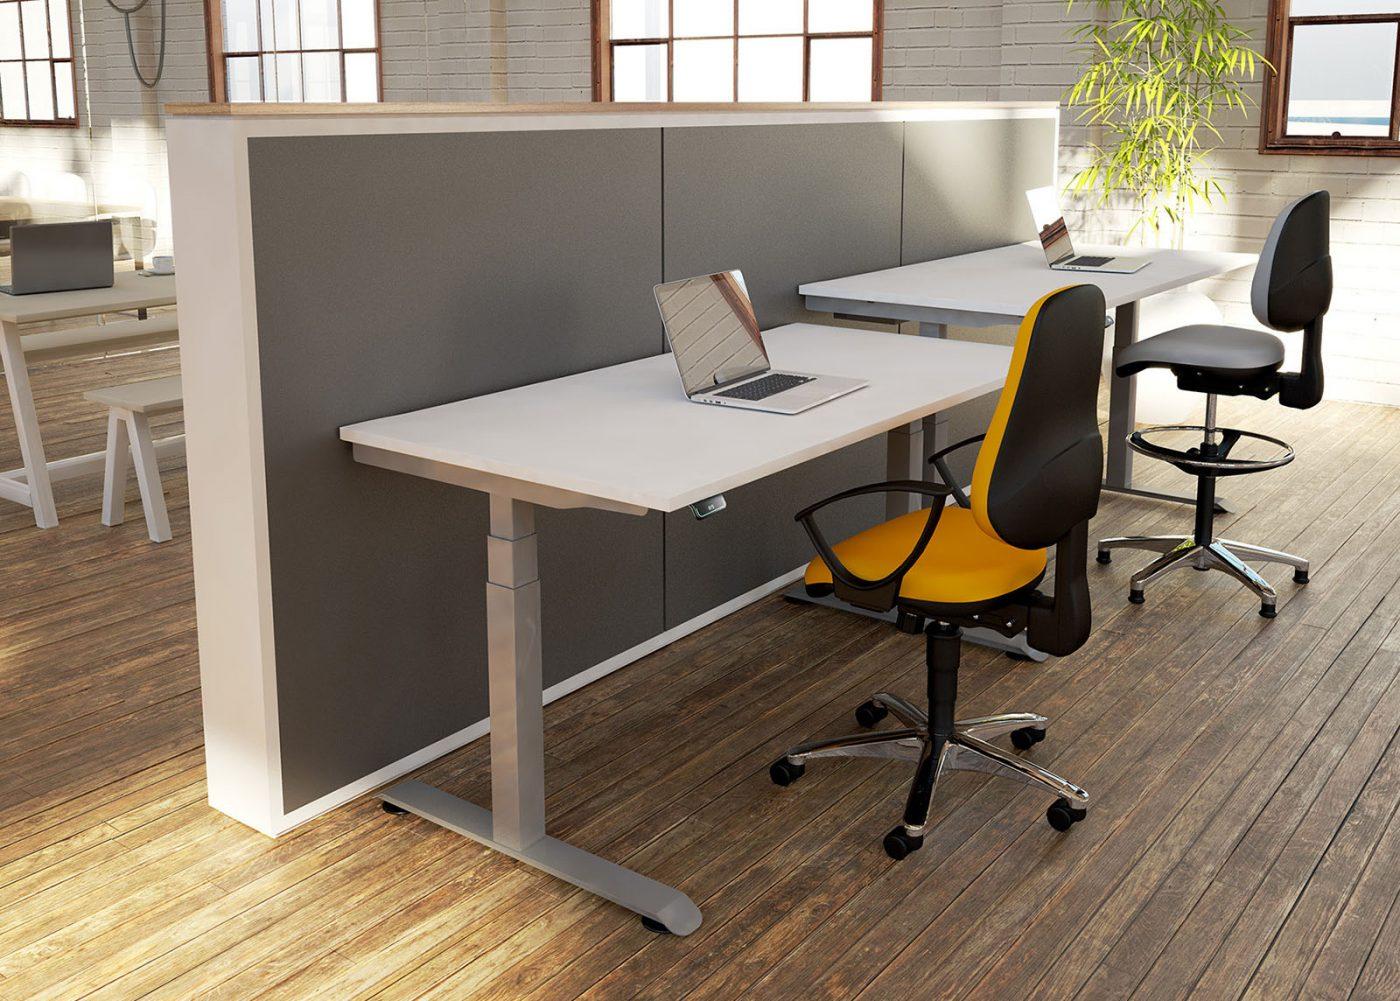 single desk, height adjustable, sit stand desk, silver frame, white finish